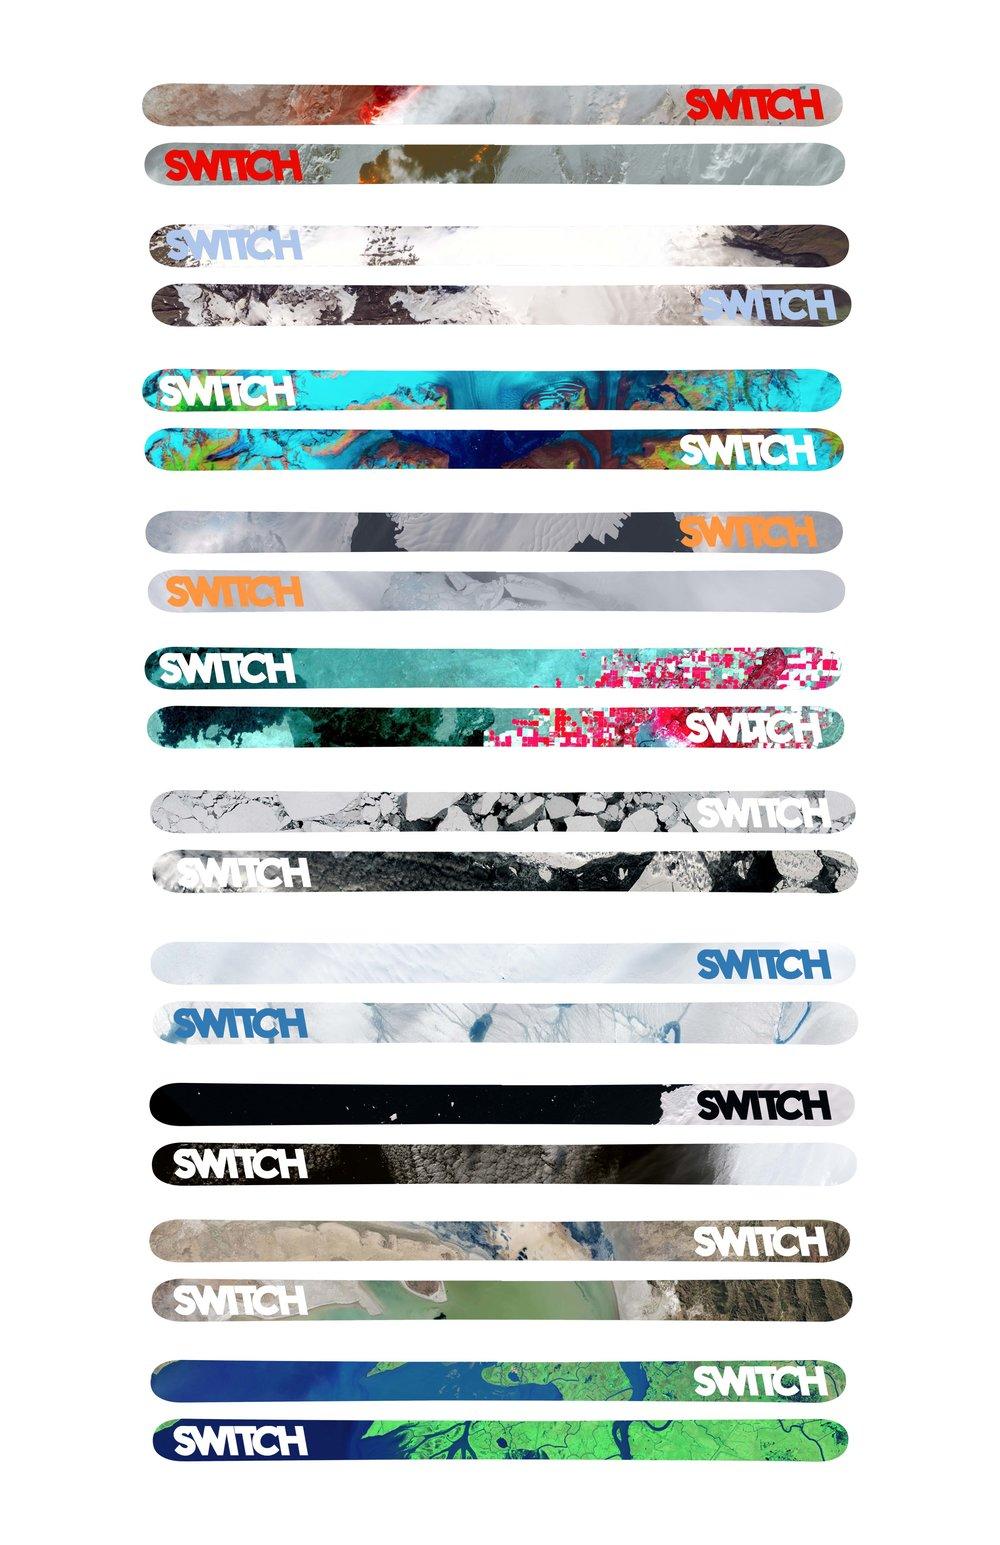 SwitchNASA.jpg